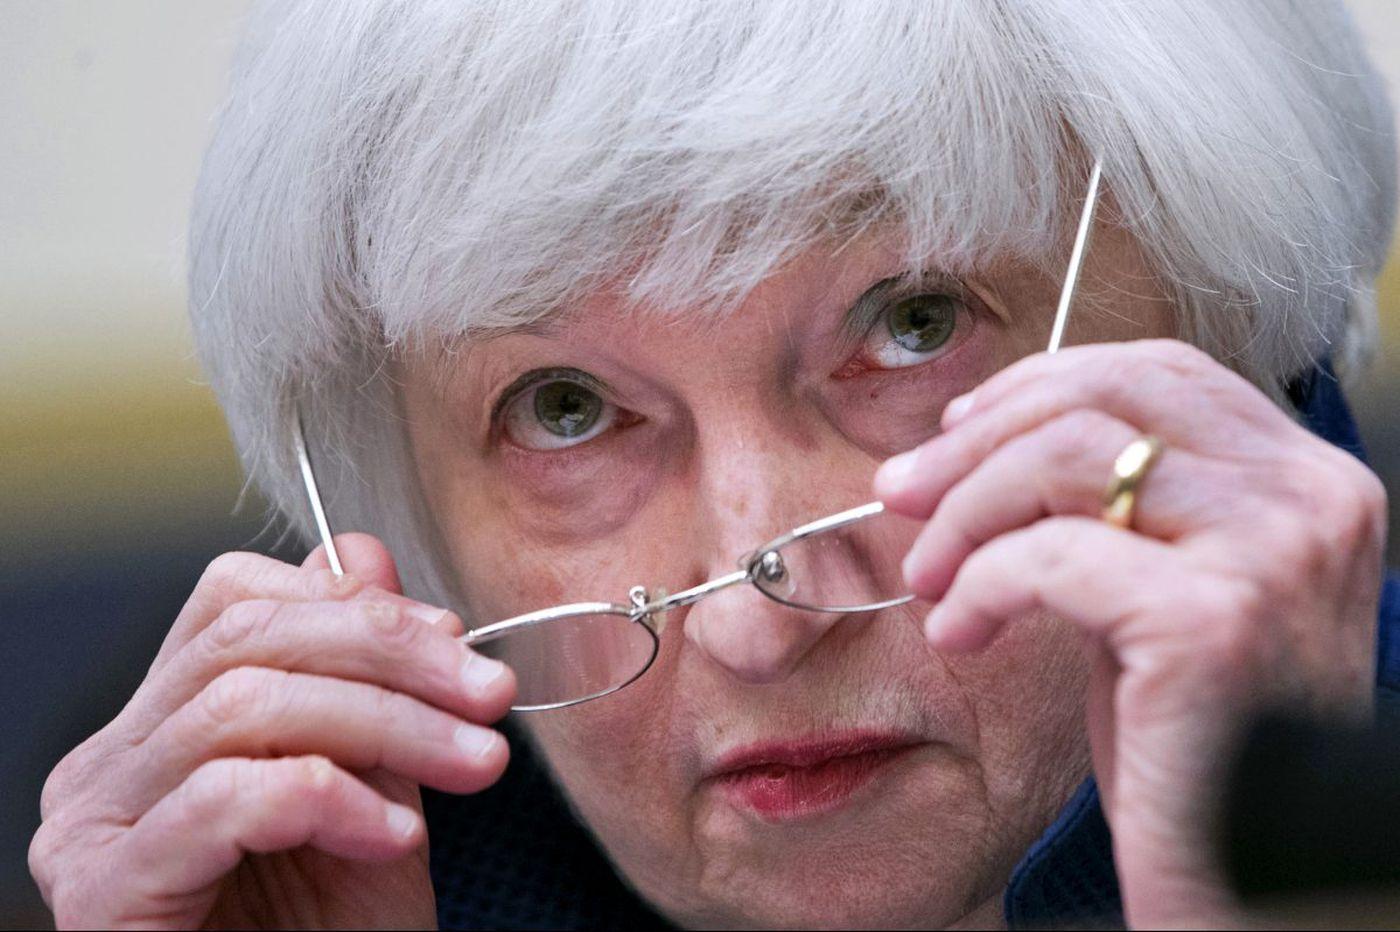 Janet Yellen at Wharton: Ex-Fed head, let go by Trump, praises her successor